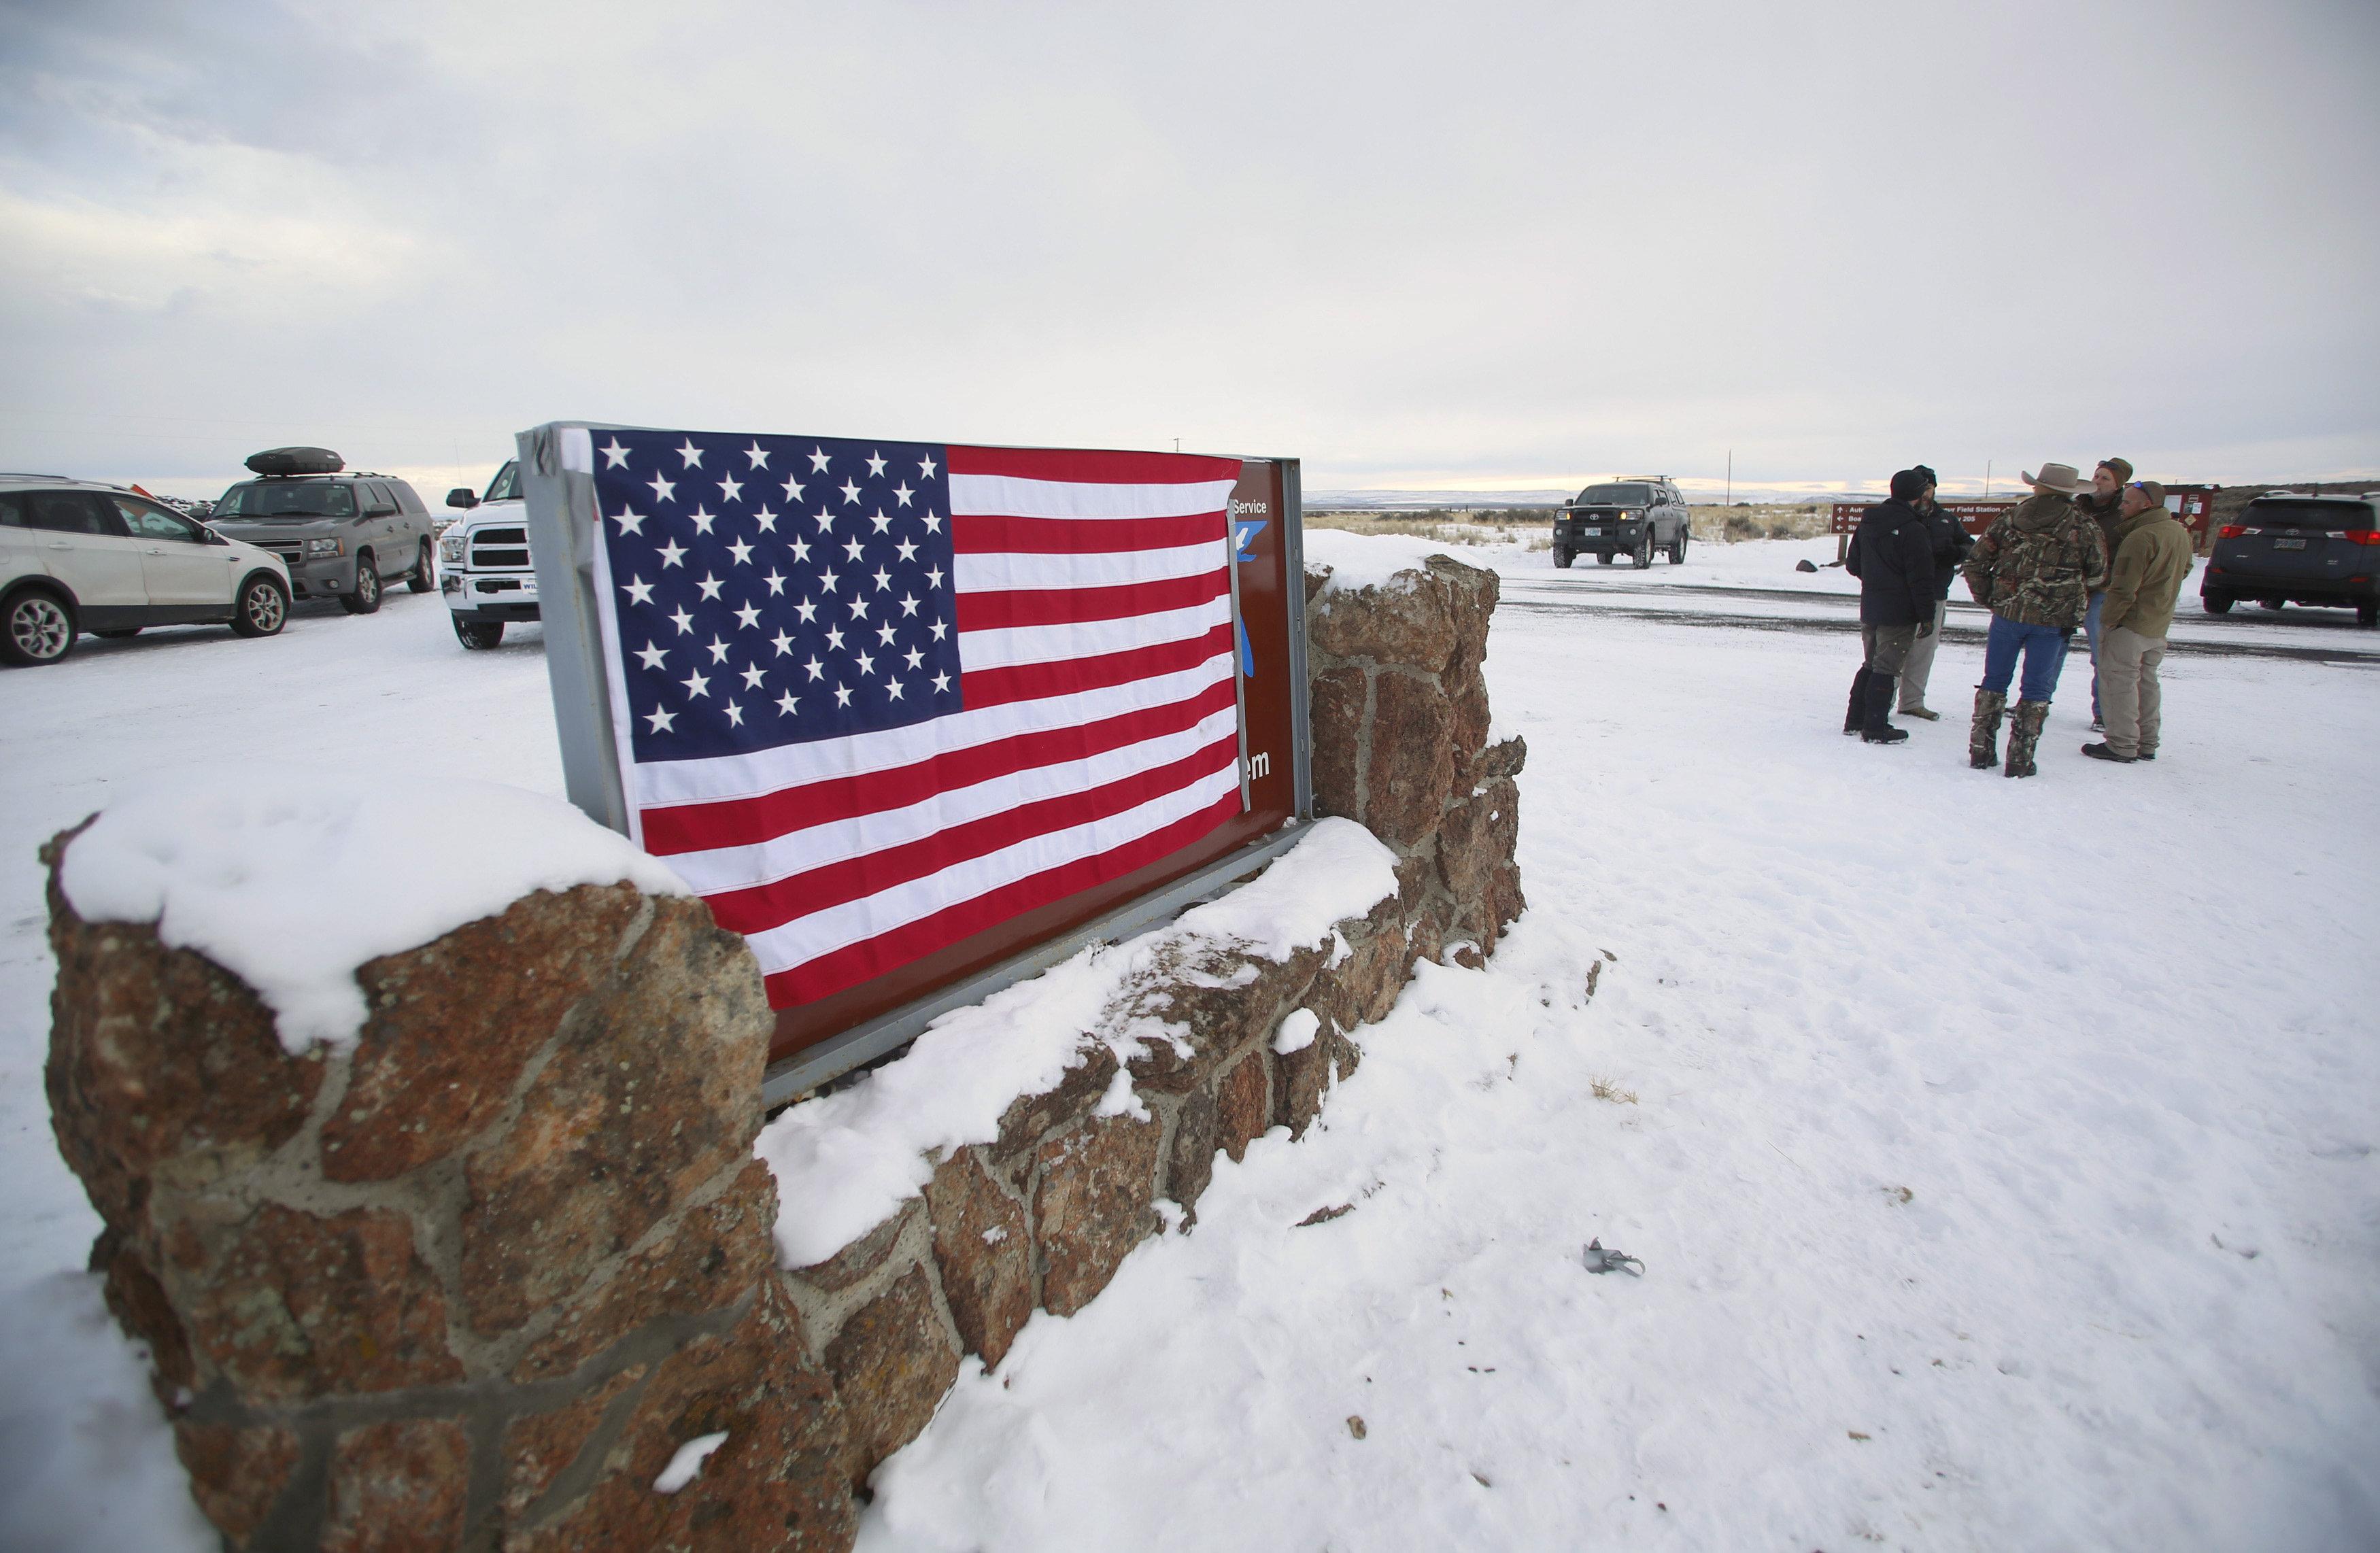 FILE PHOTO: A U.S. flag covers a sign at the entrance of the Malheur National Wildlife Refuge near Burns, Oregon, U.S. January 3, 2016. REUTERS/Jim Urquhart/File Photo